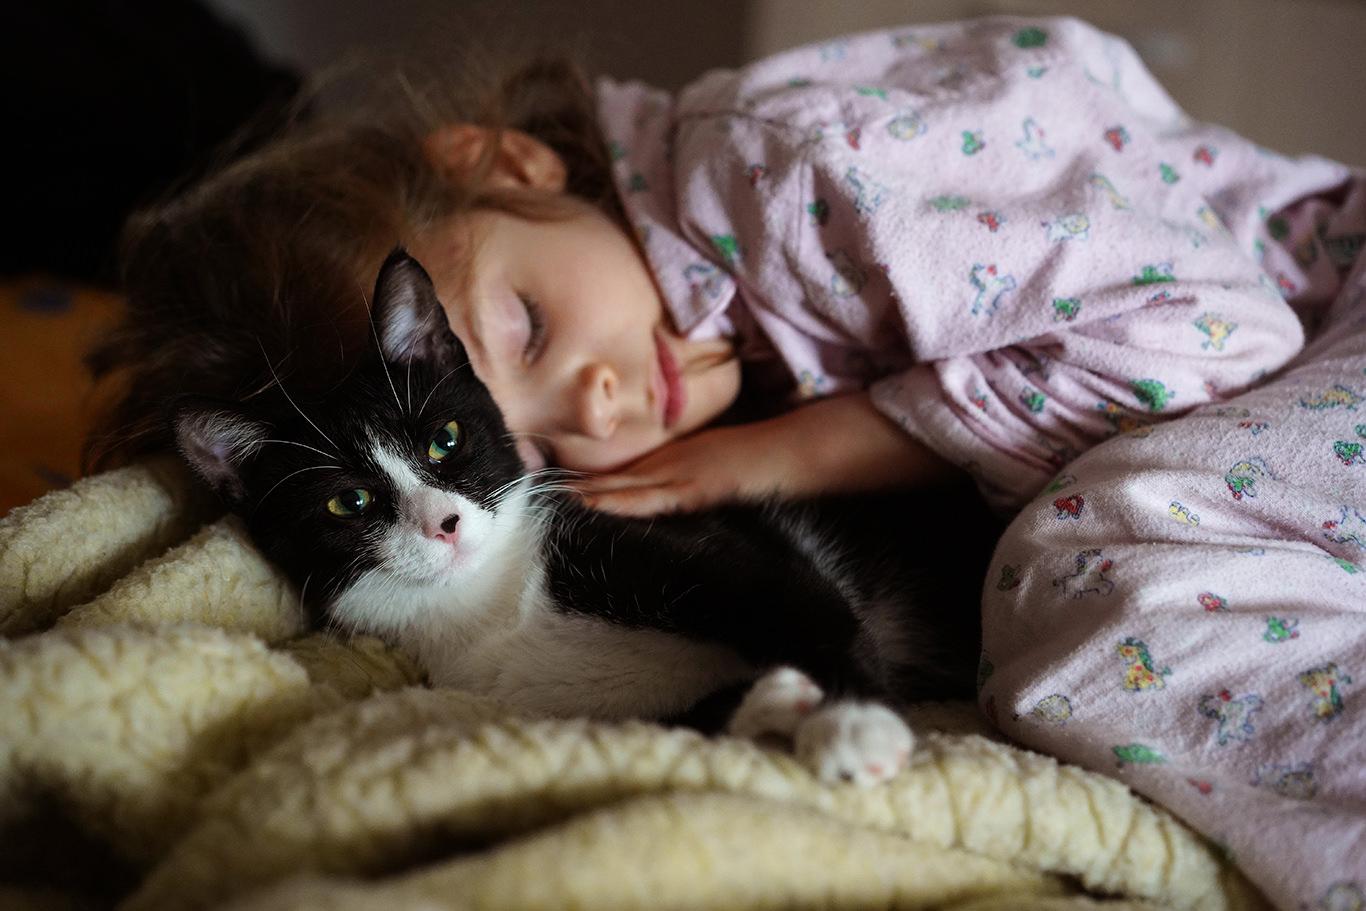 Somnul de dupa-amiaza